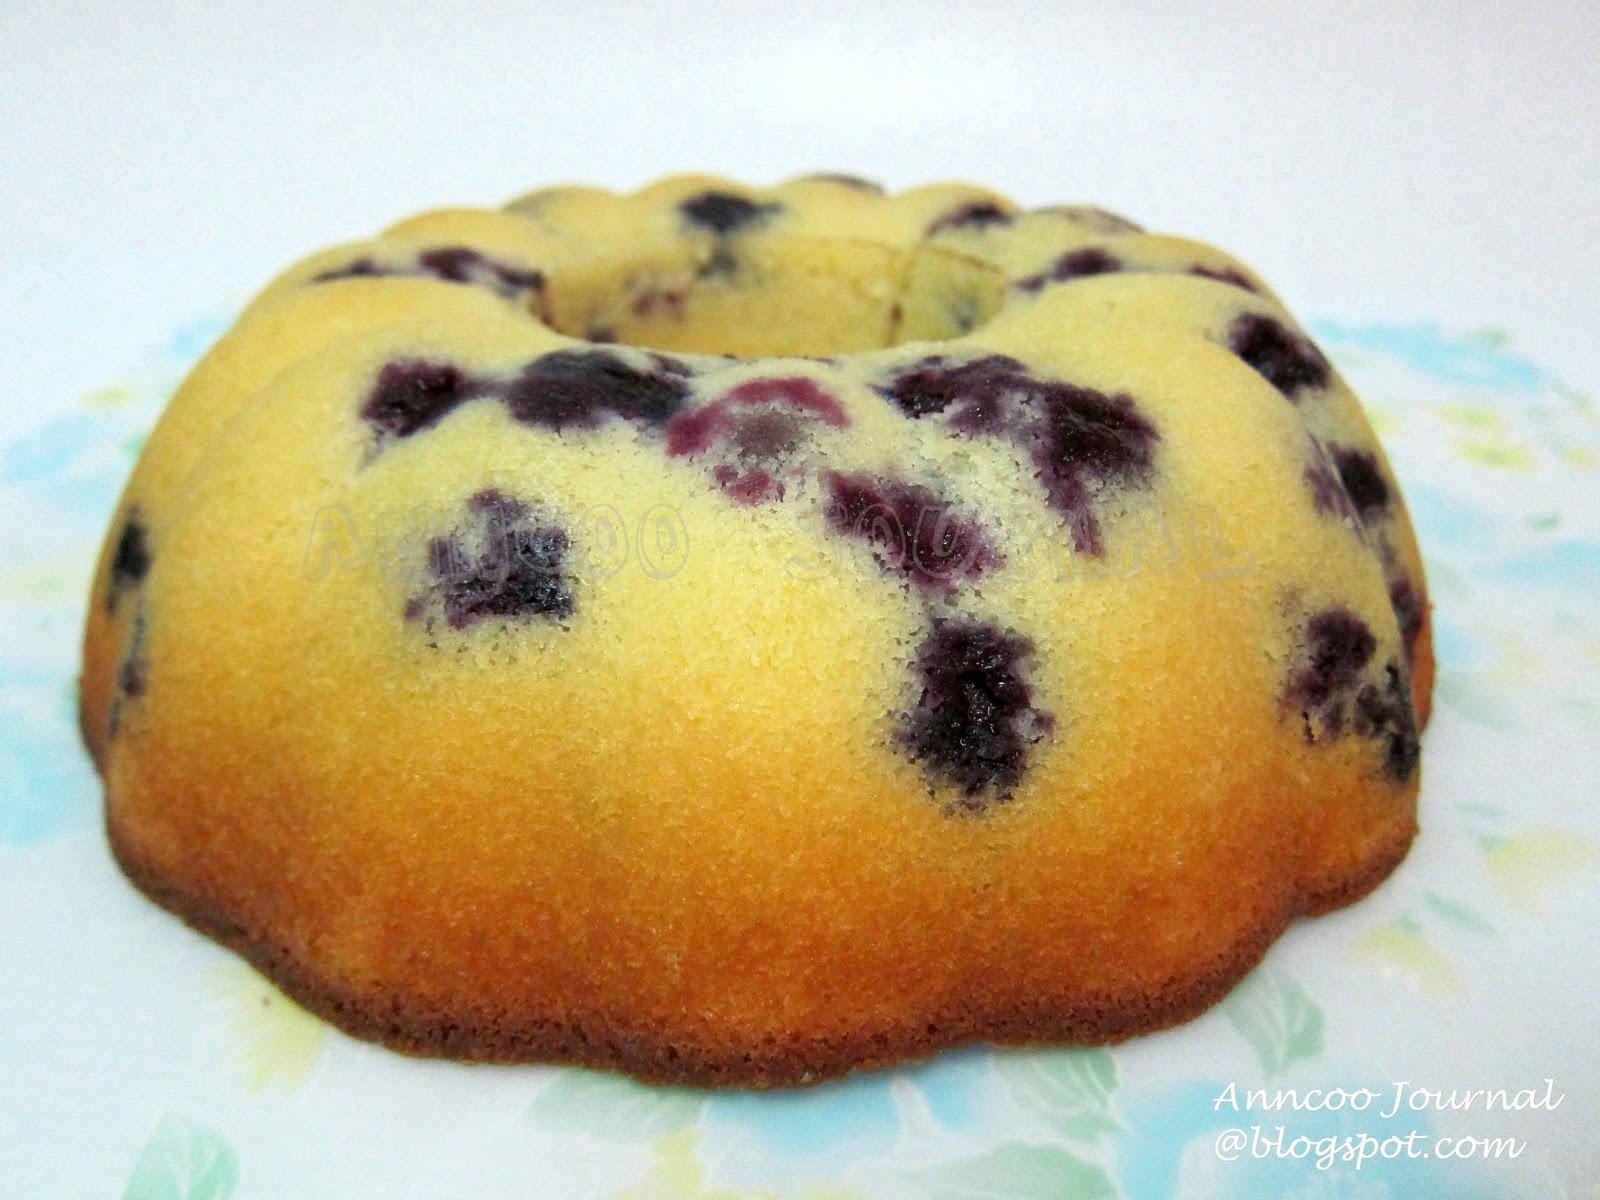 Blueberry Pound Cake | Anncoo Journal